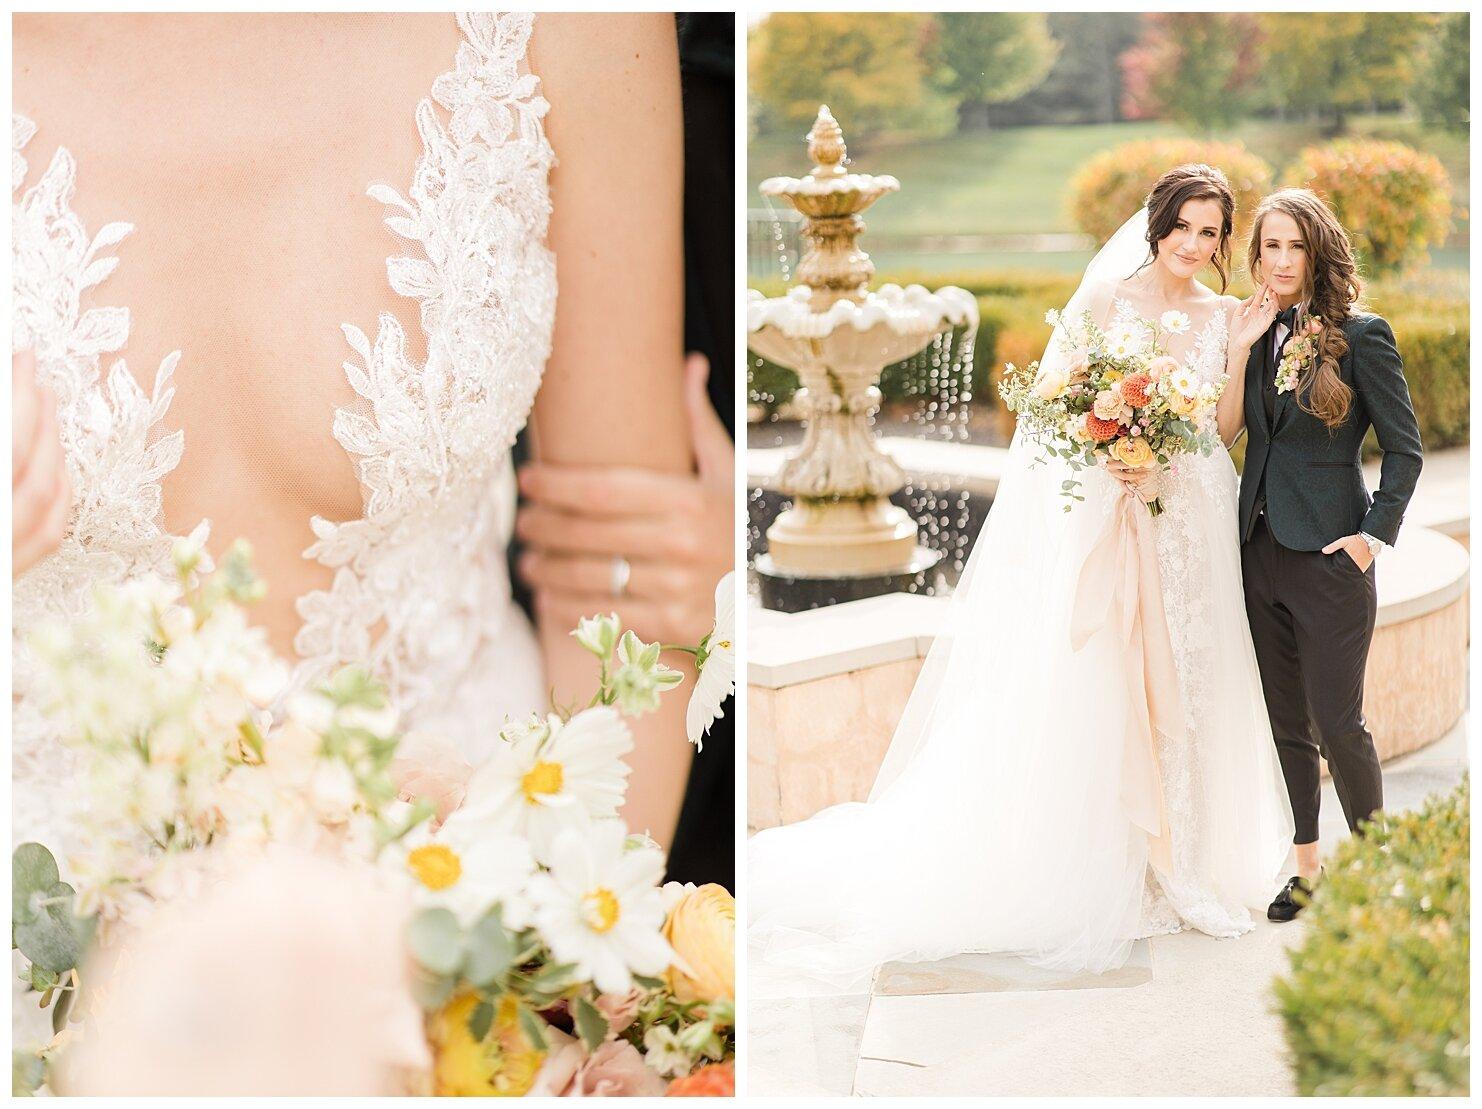 club-corazon-columbus-wedding-photography_0036.jpg